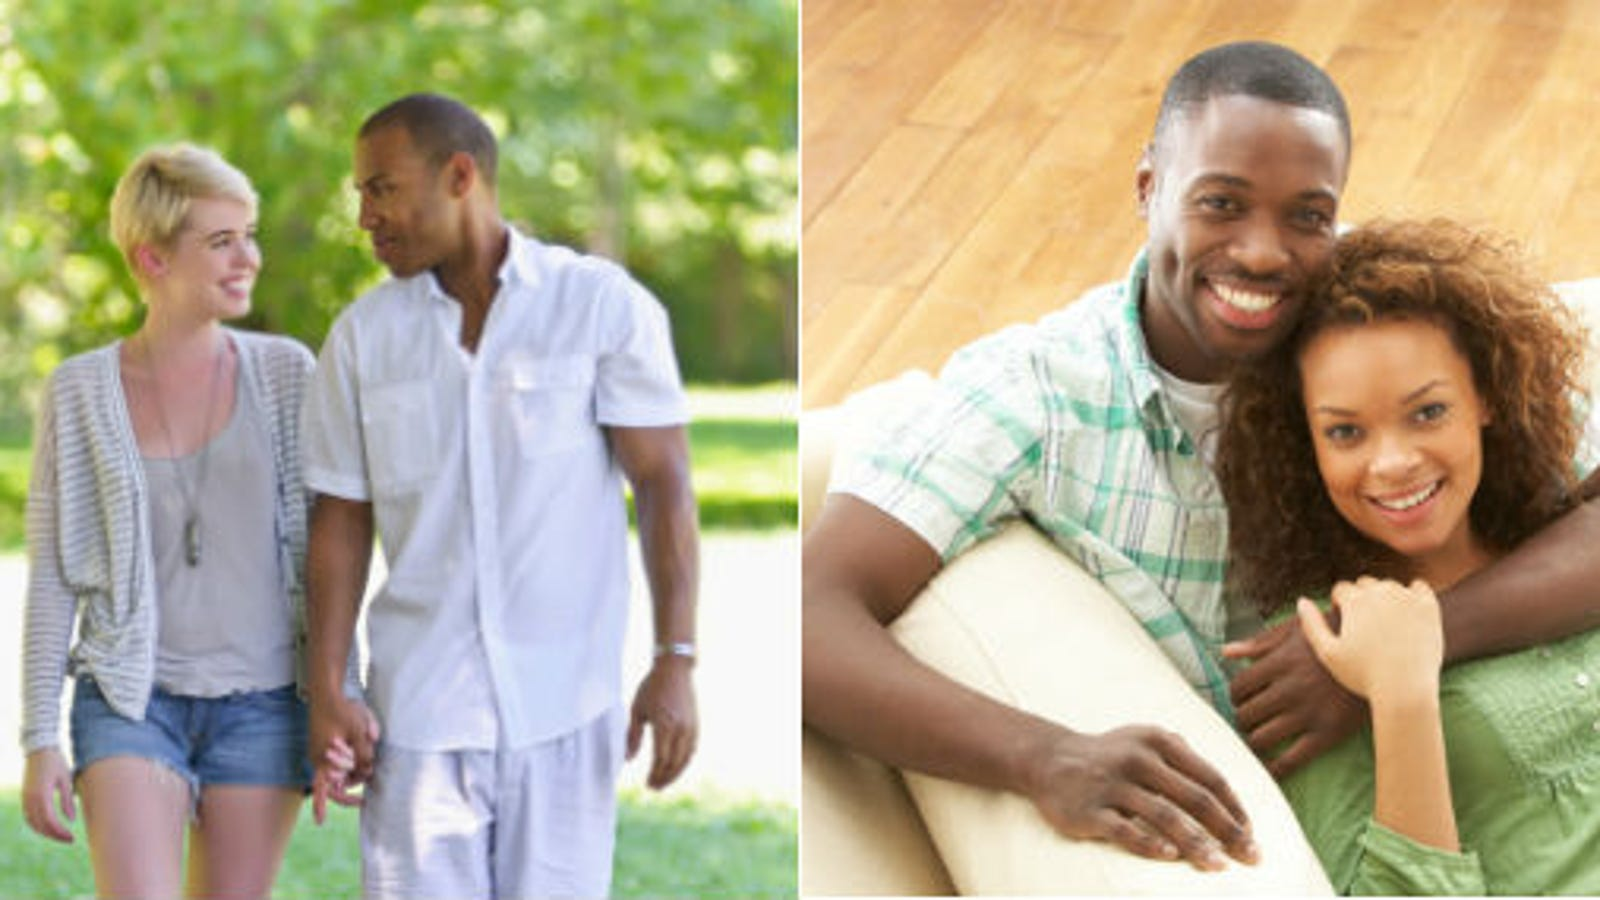 im dating the pastors son